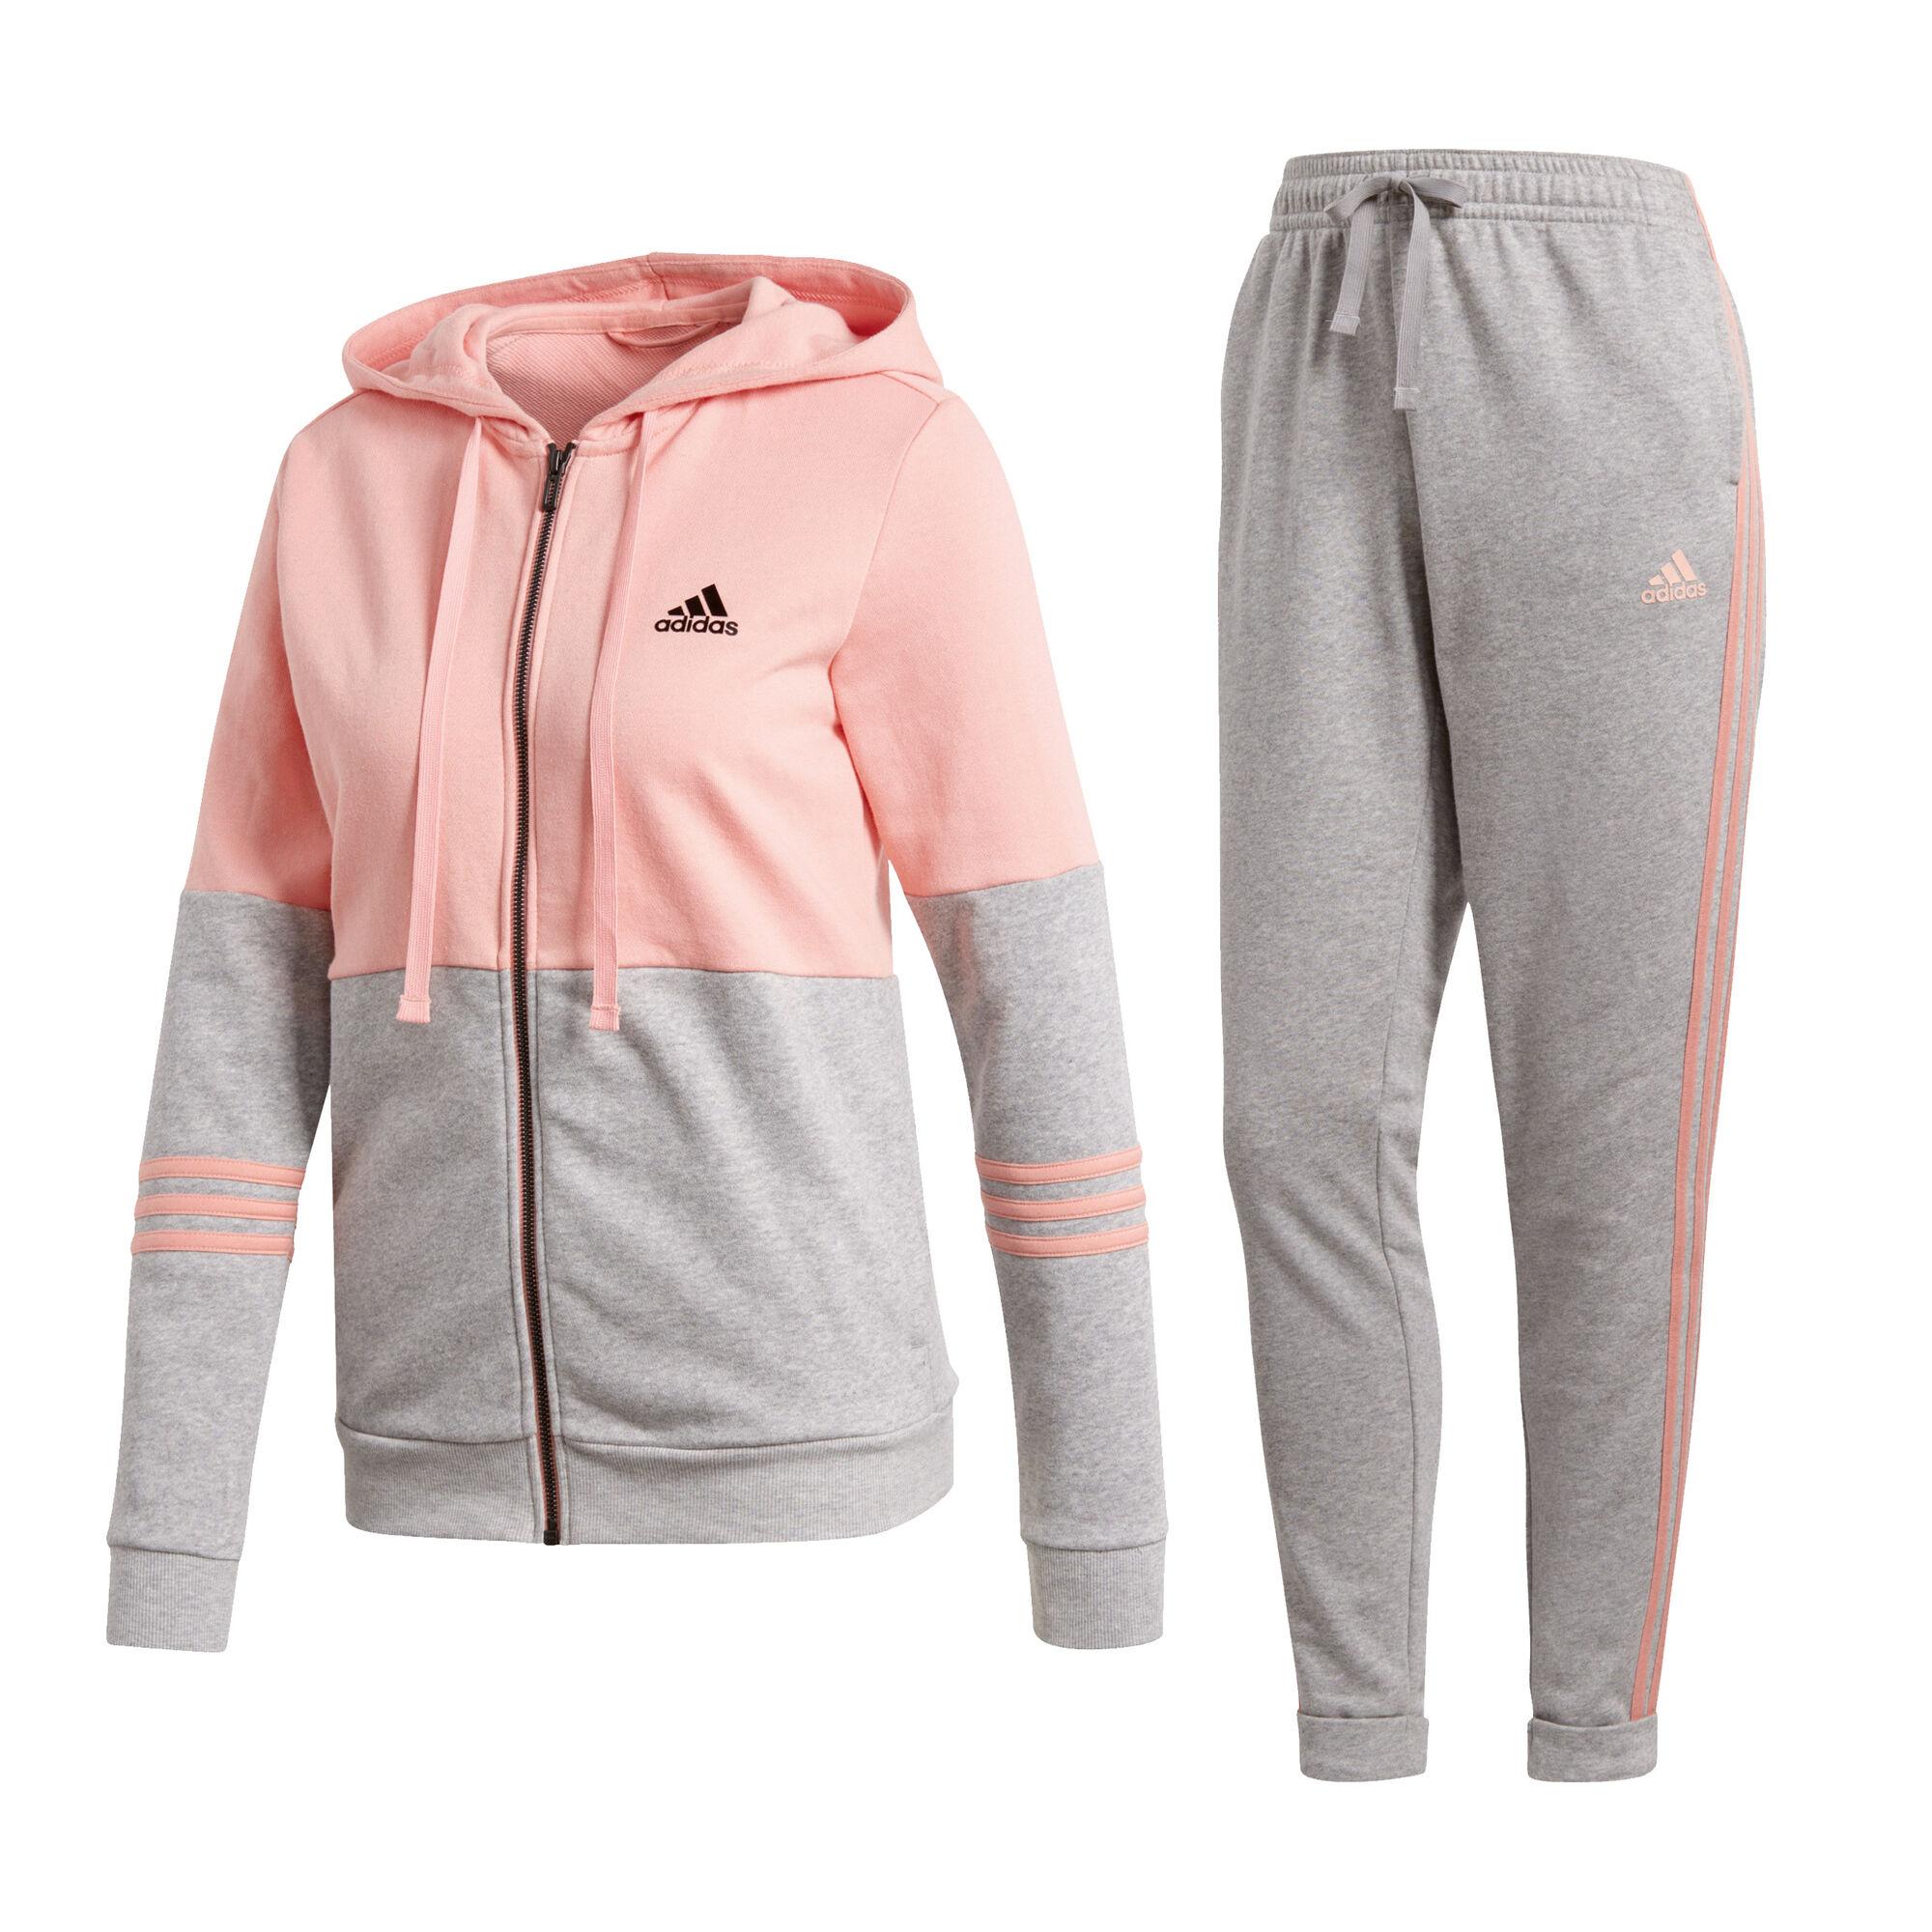 dfd97f3ffe buy adidas Co Energize Tracksuit Women - Pink, Lightgrey online ...